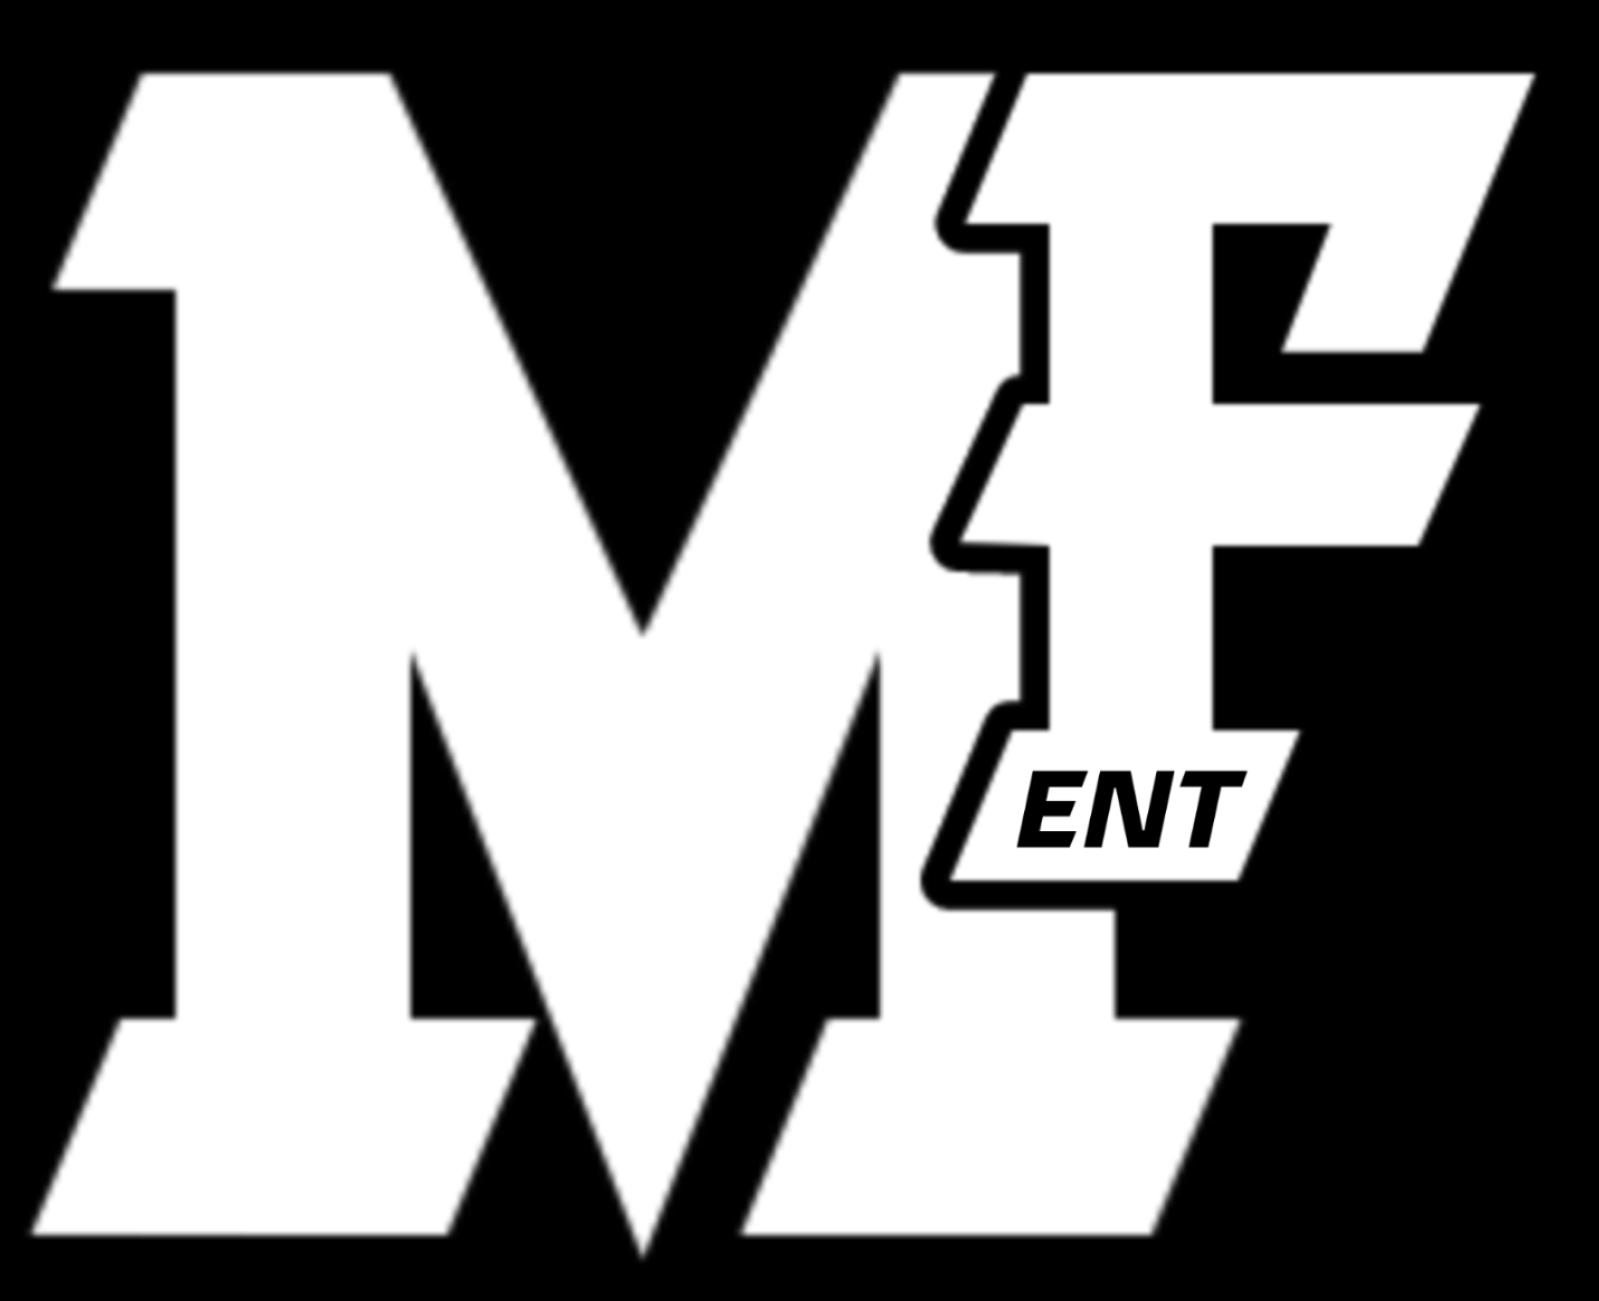 MFE Entertainment